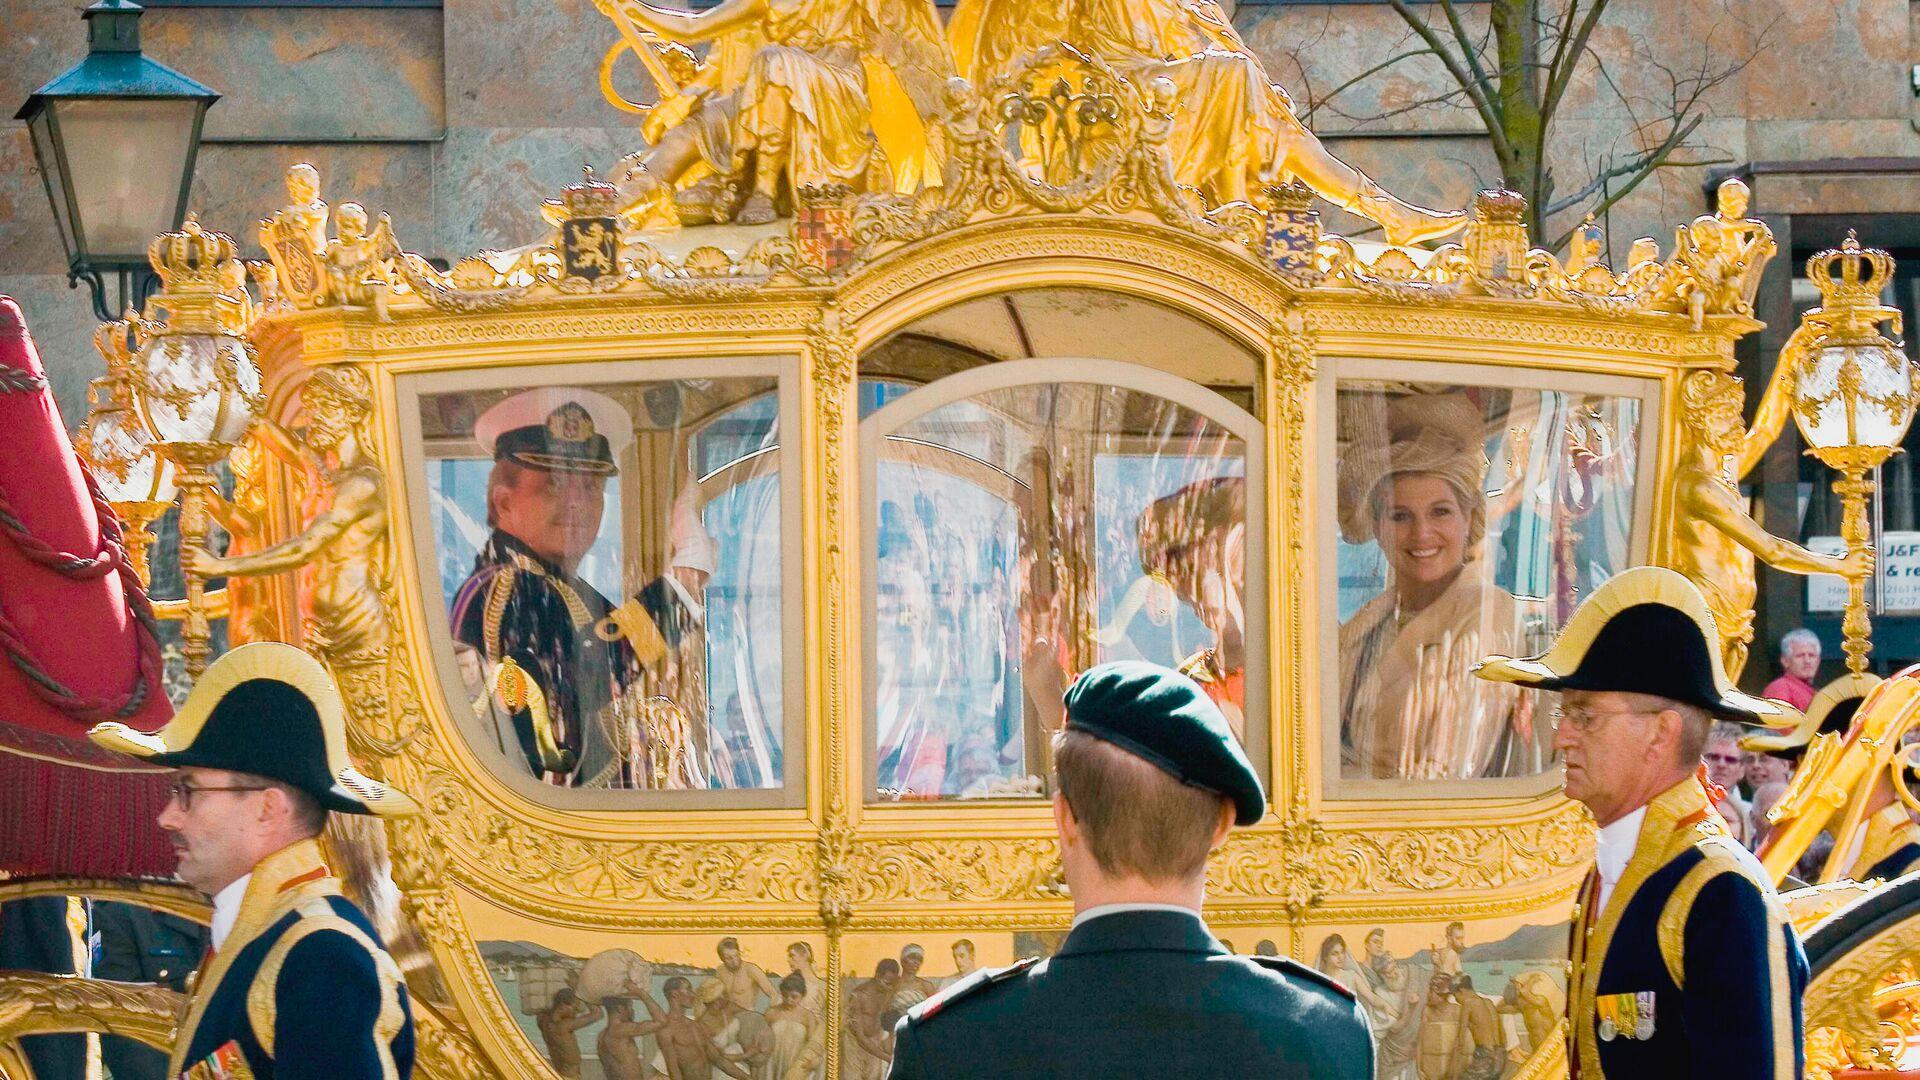 Карета короля Нидерландов - Sputnik Латвия, 1920, 15.09.2021